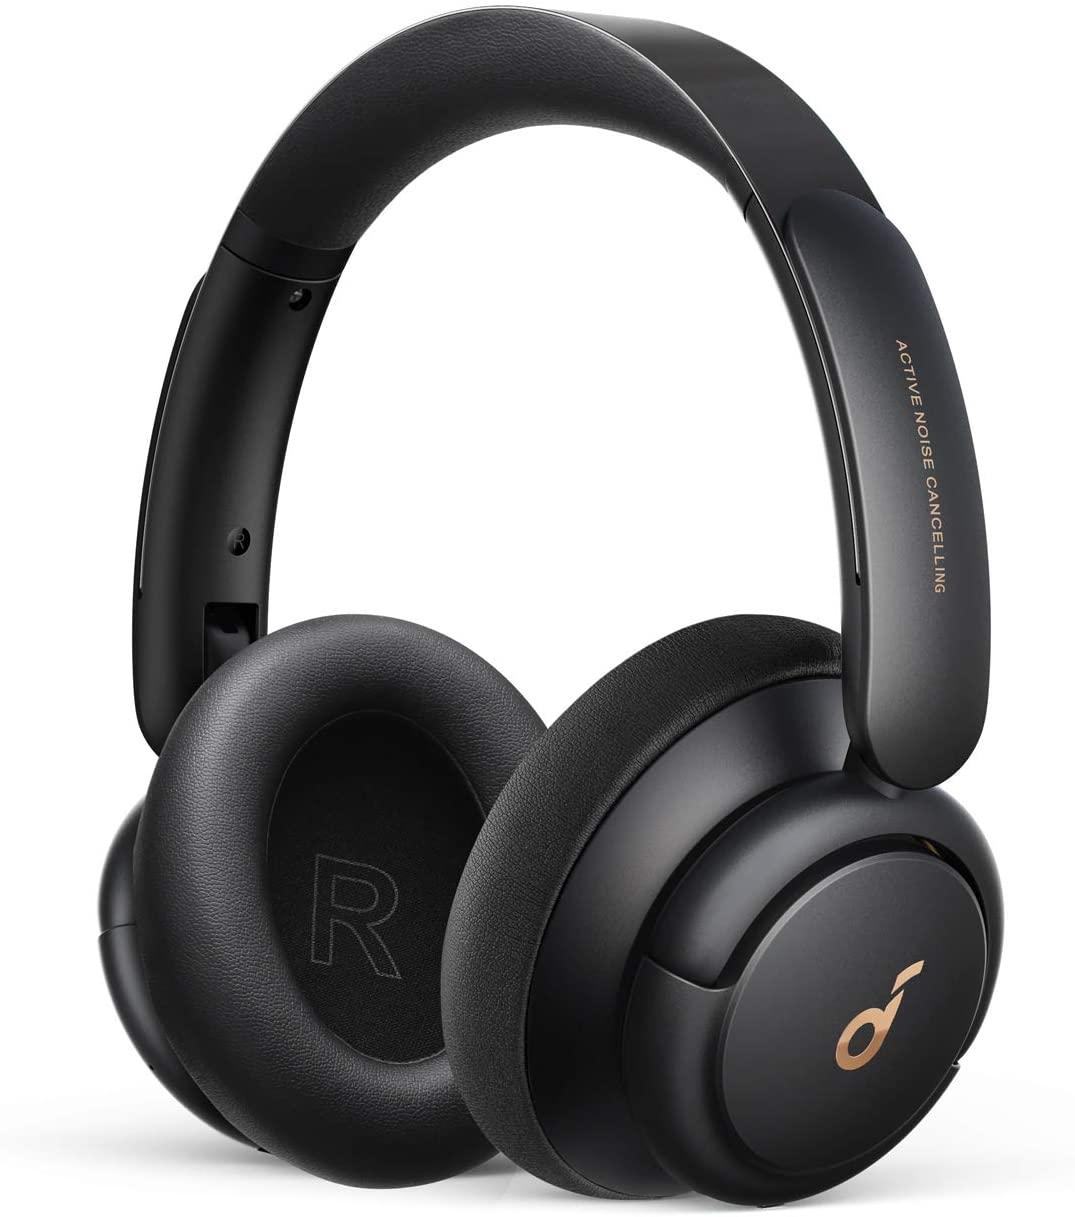 Soundcore Life Q30 Hybrid Active Noise Cancelling Headphones Review